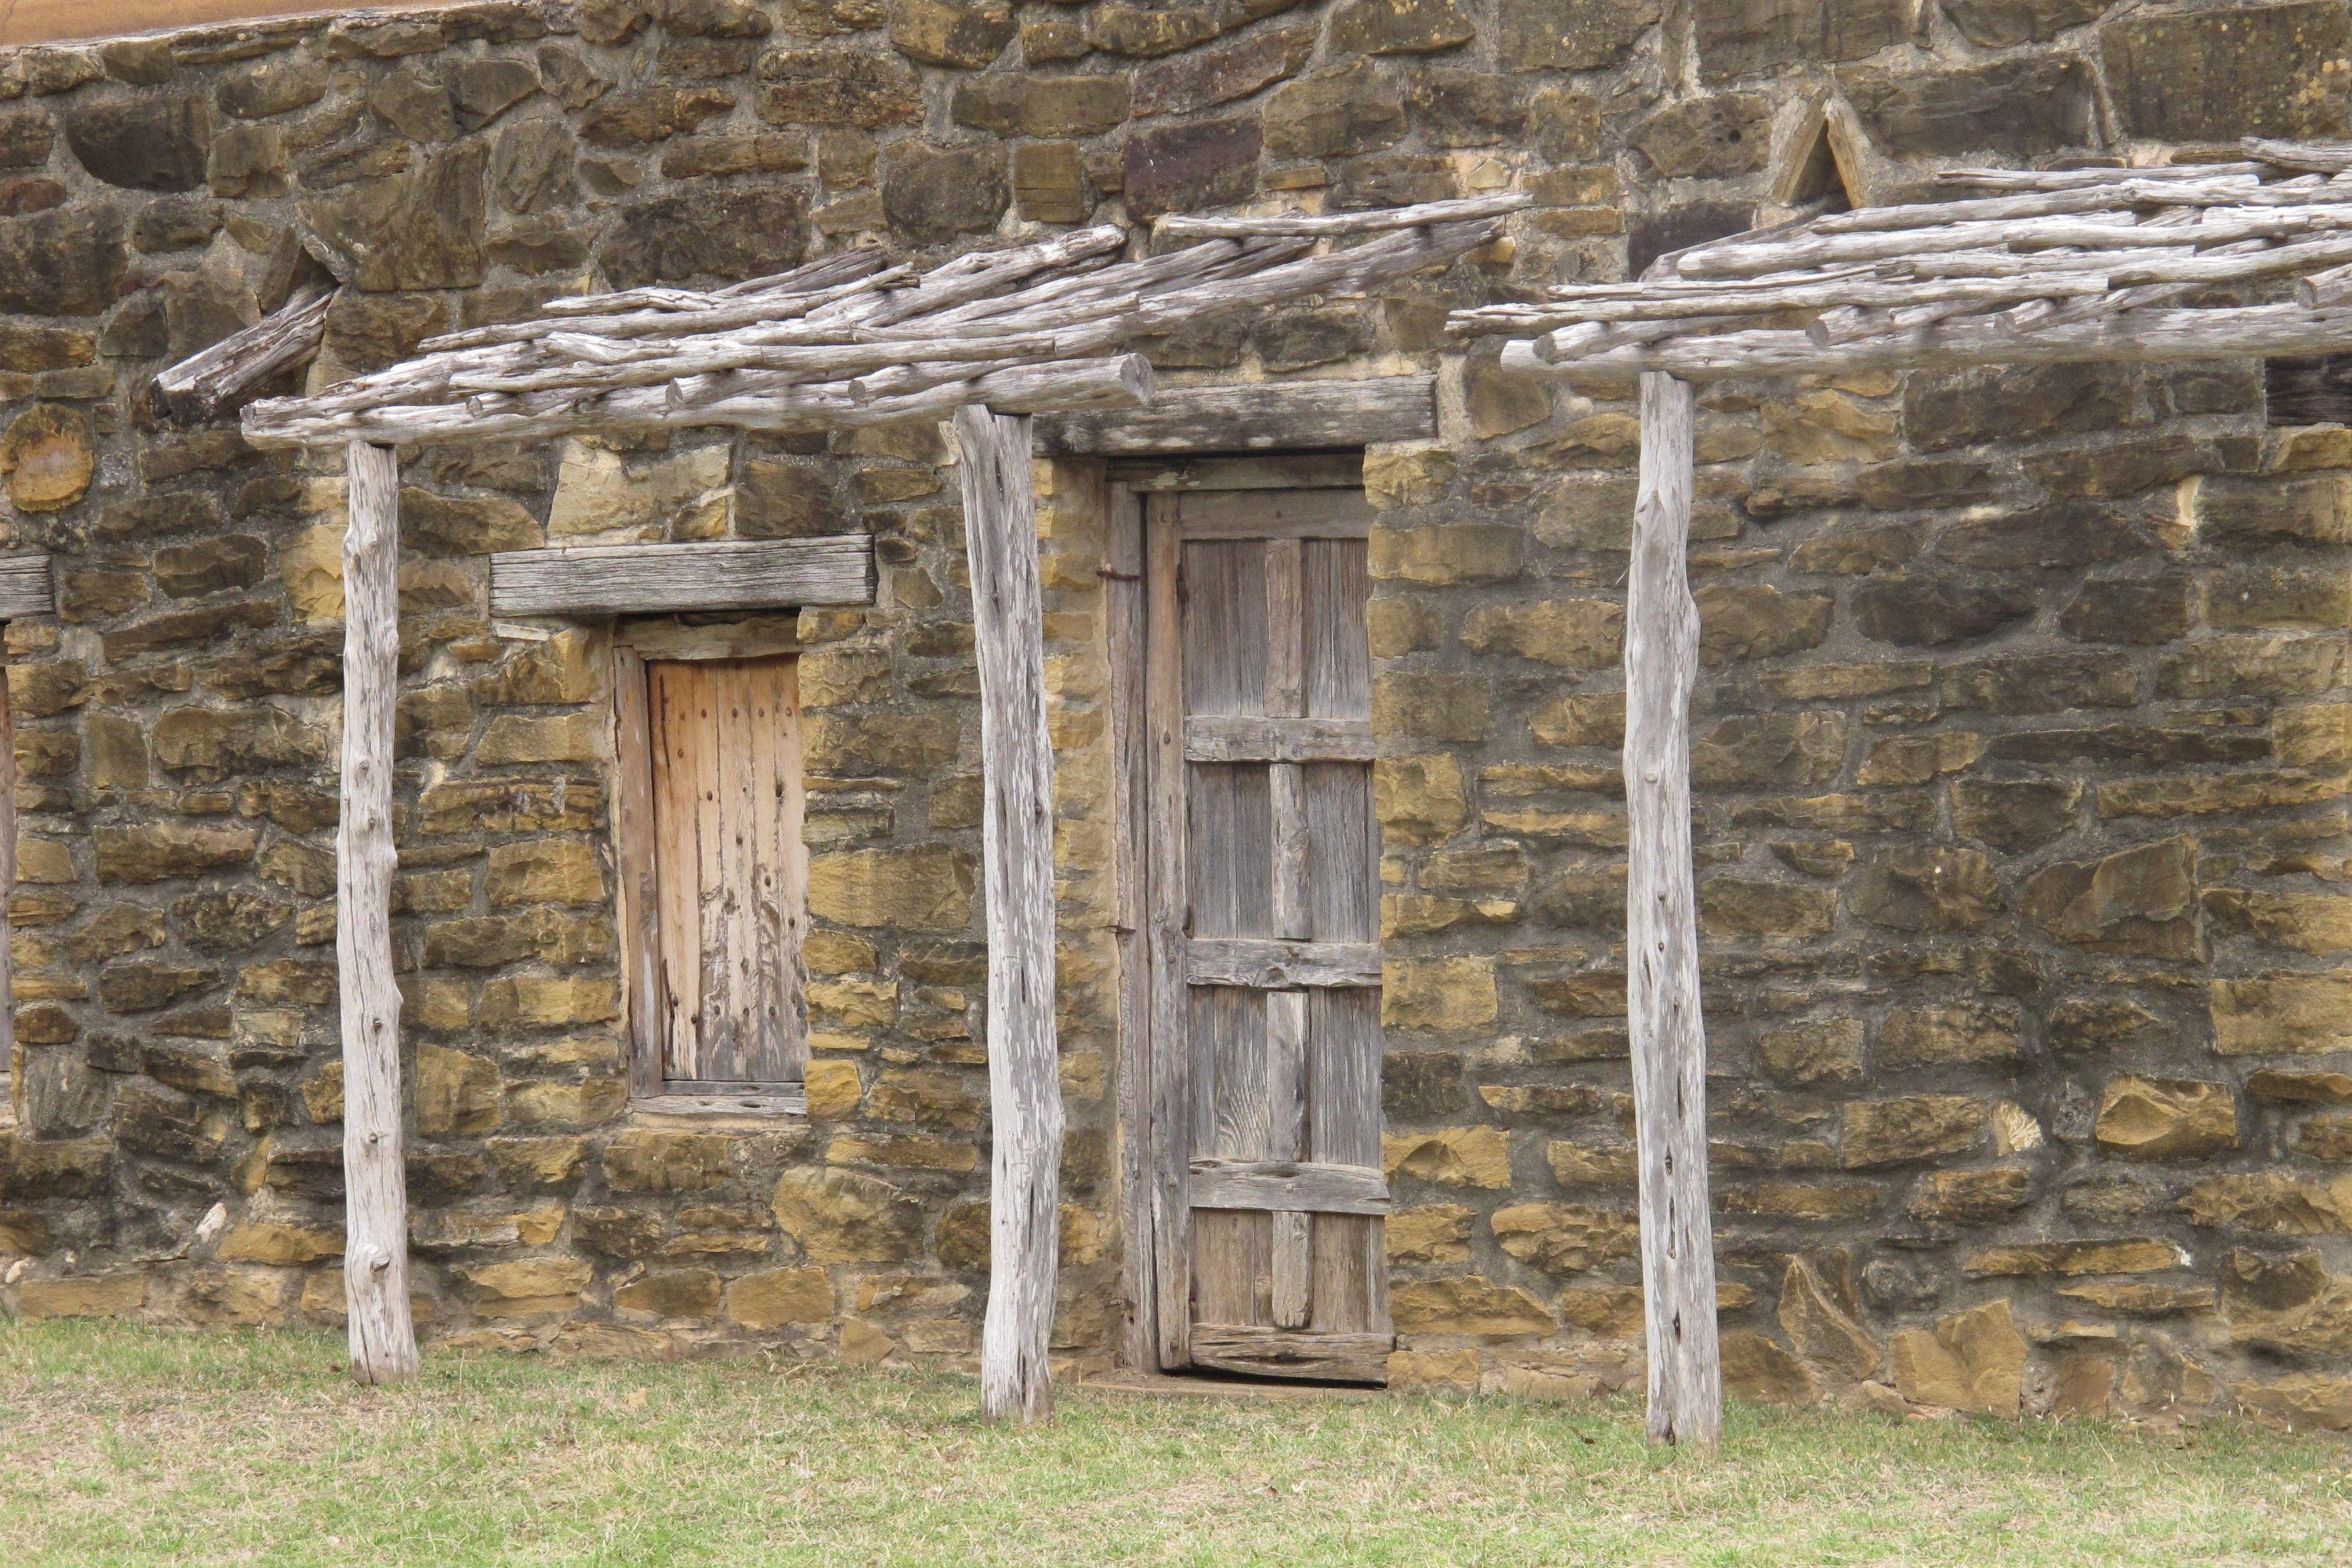 San Antonio Missions National Historical Park HQ in San Antonio, TX